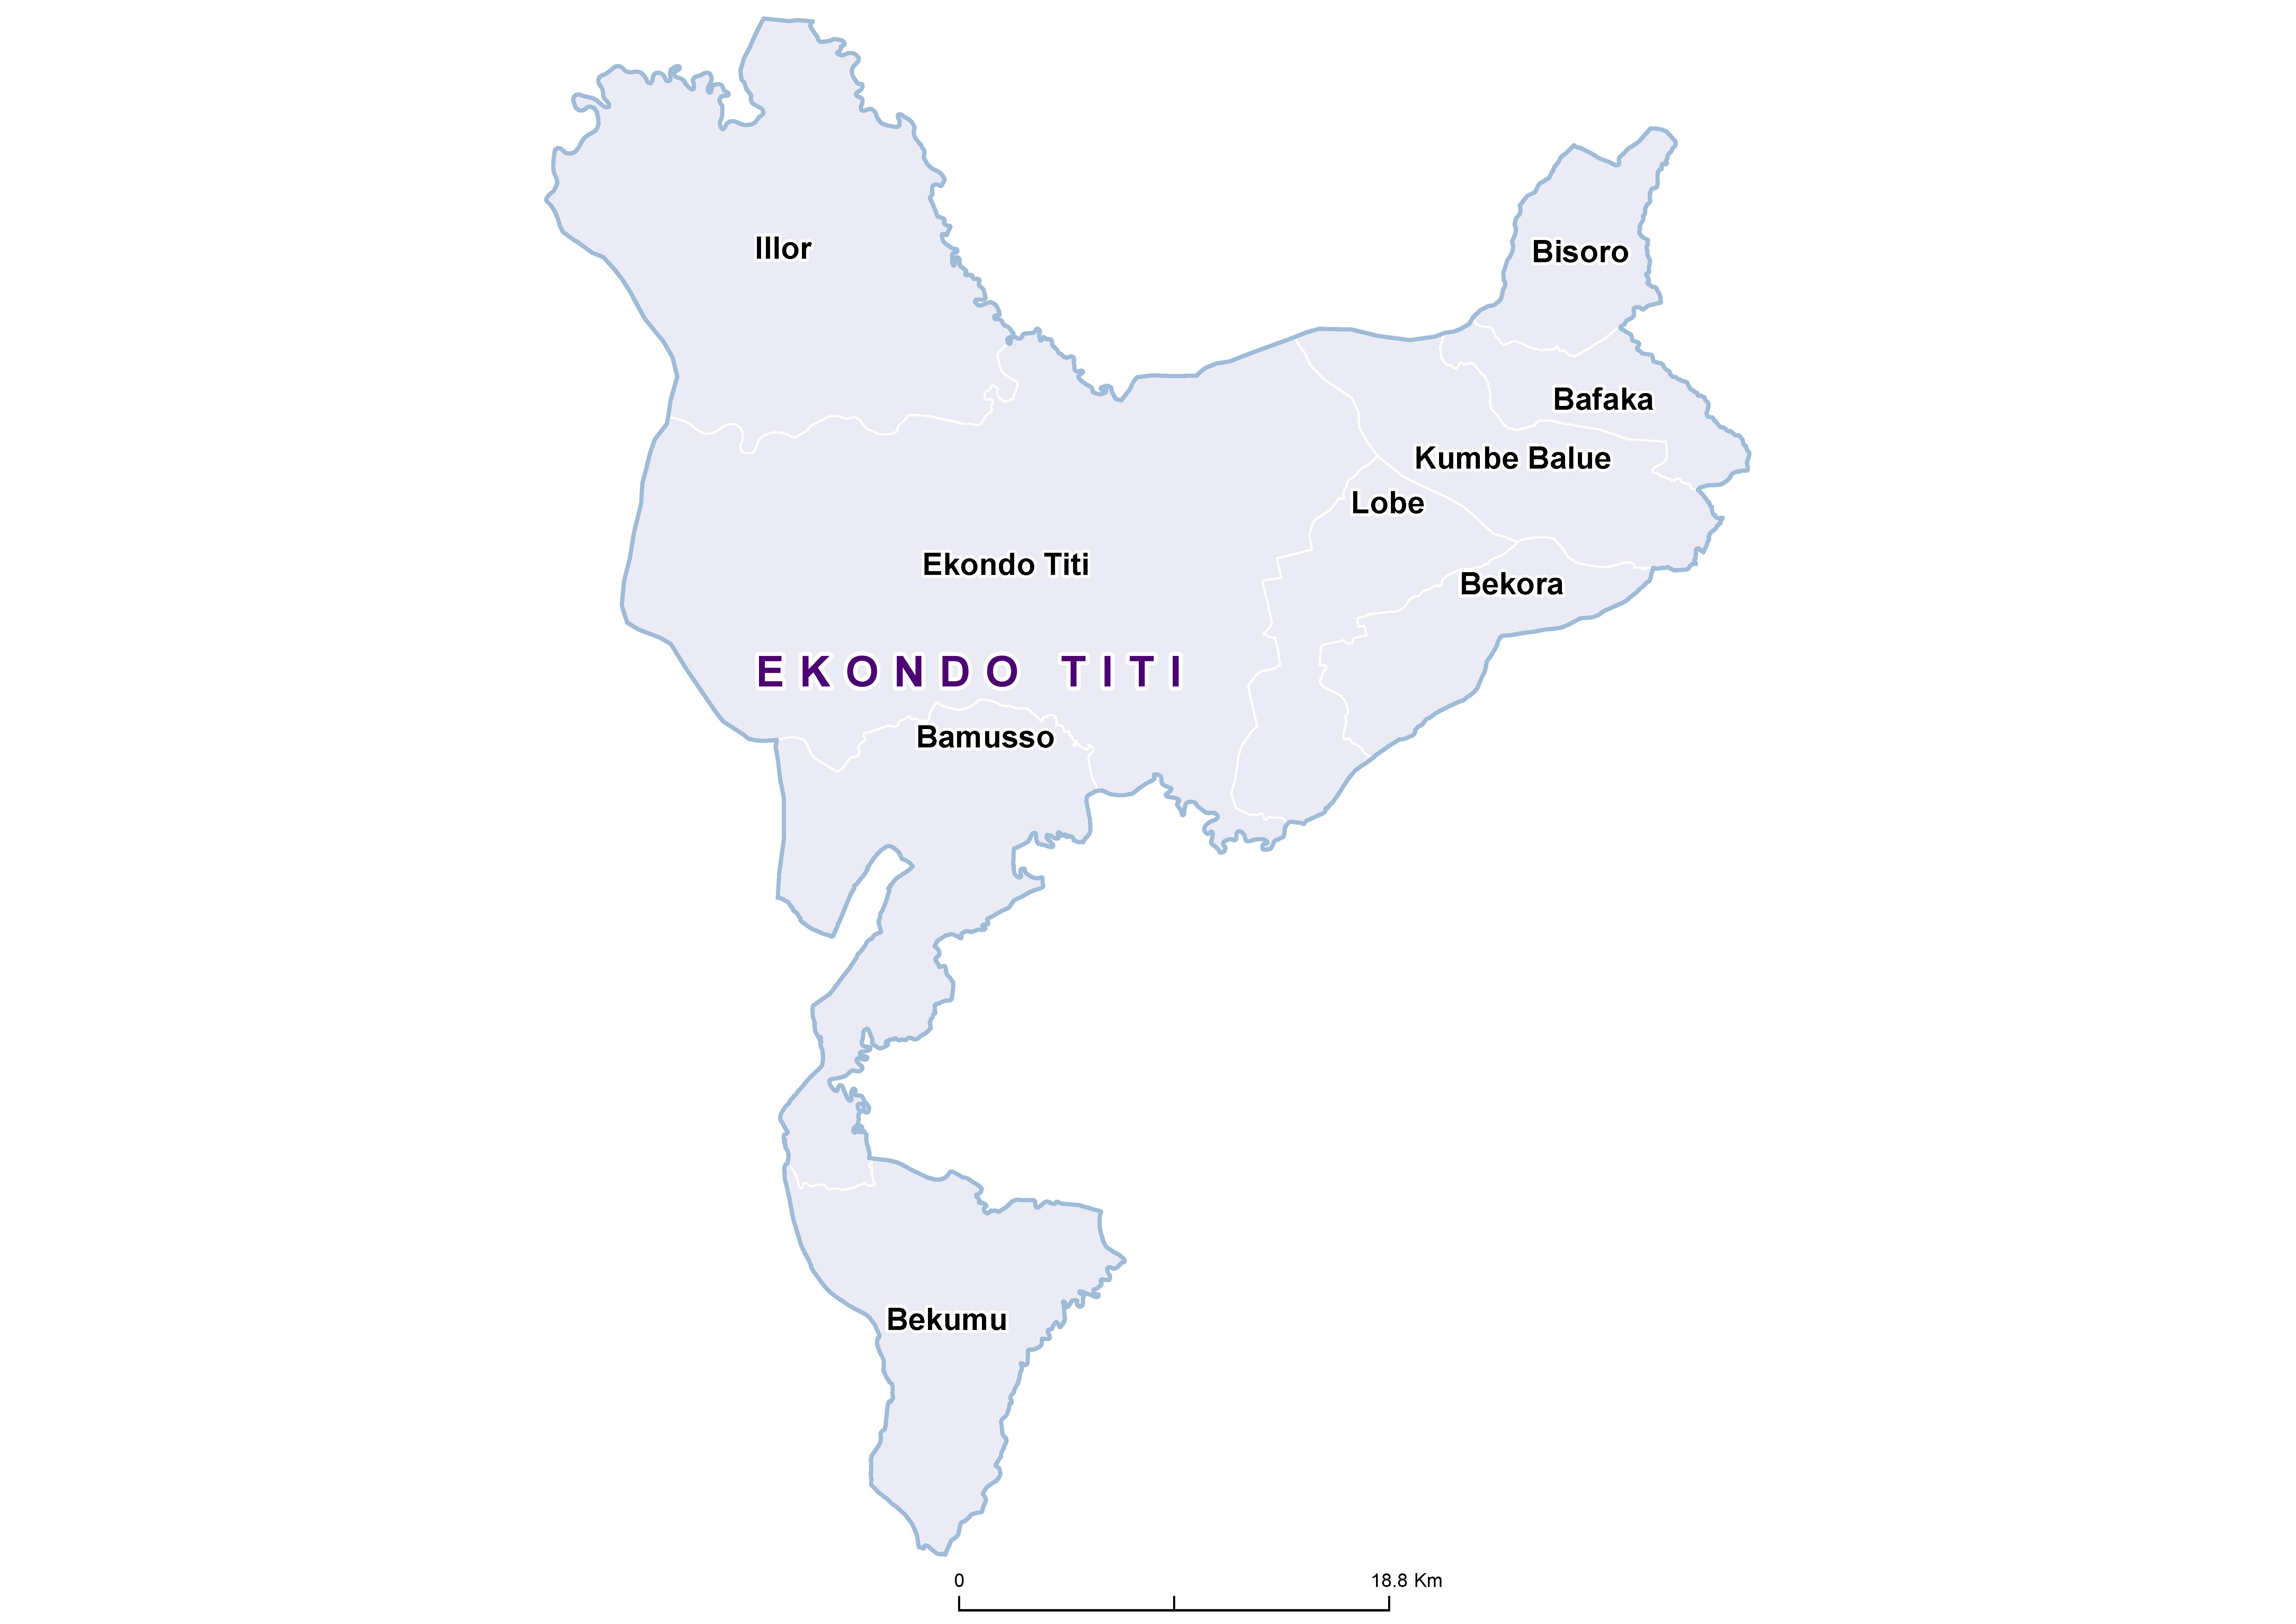 Ekondo titi STH 20180001